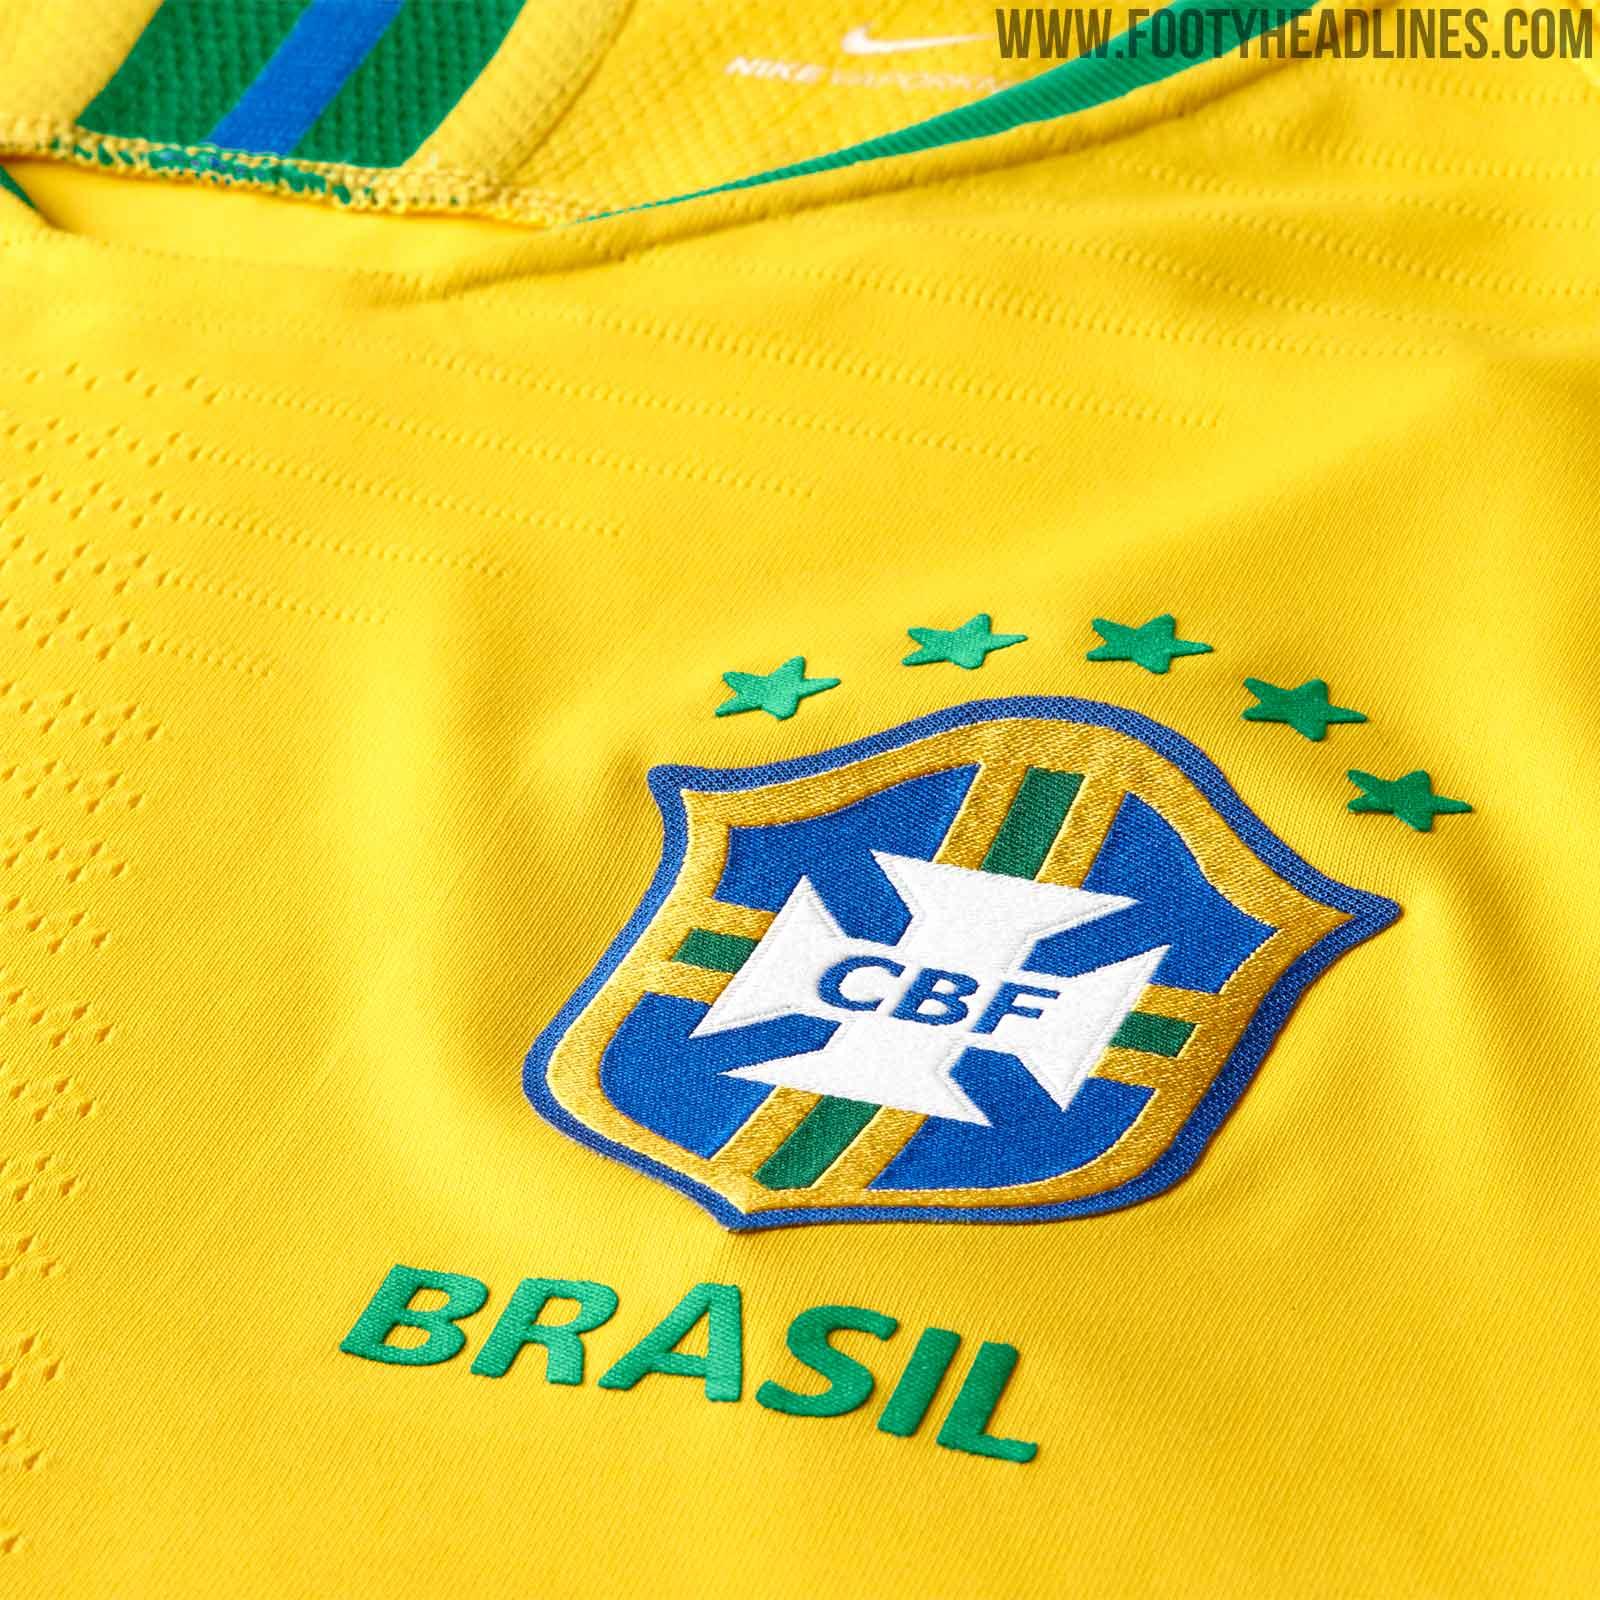 Best Brazil World Cup 2018 - brazil-2018-world-cup-home-kit-4  Image_415677 .jpg